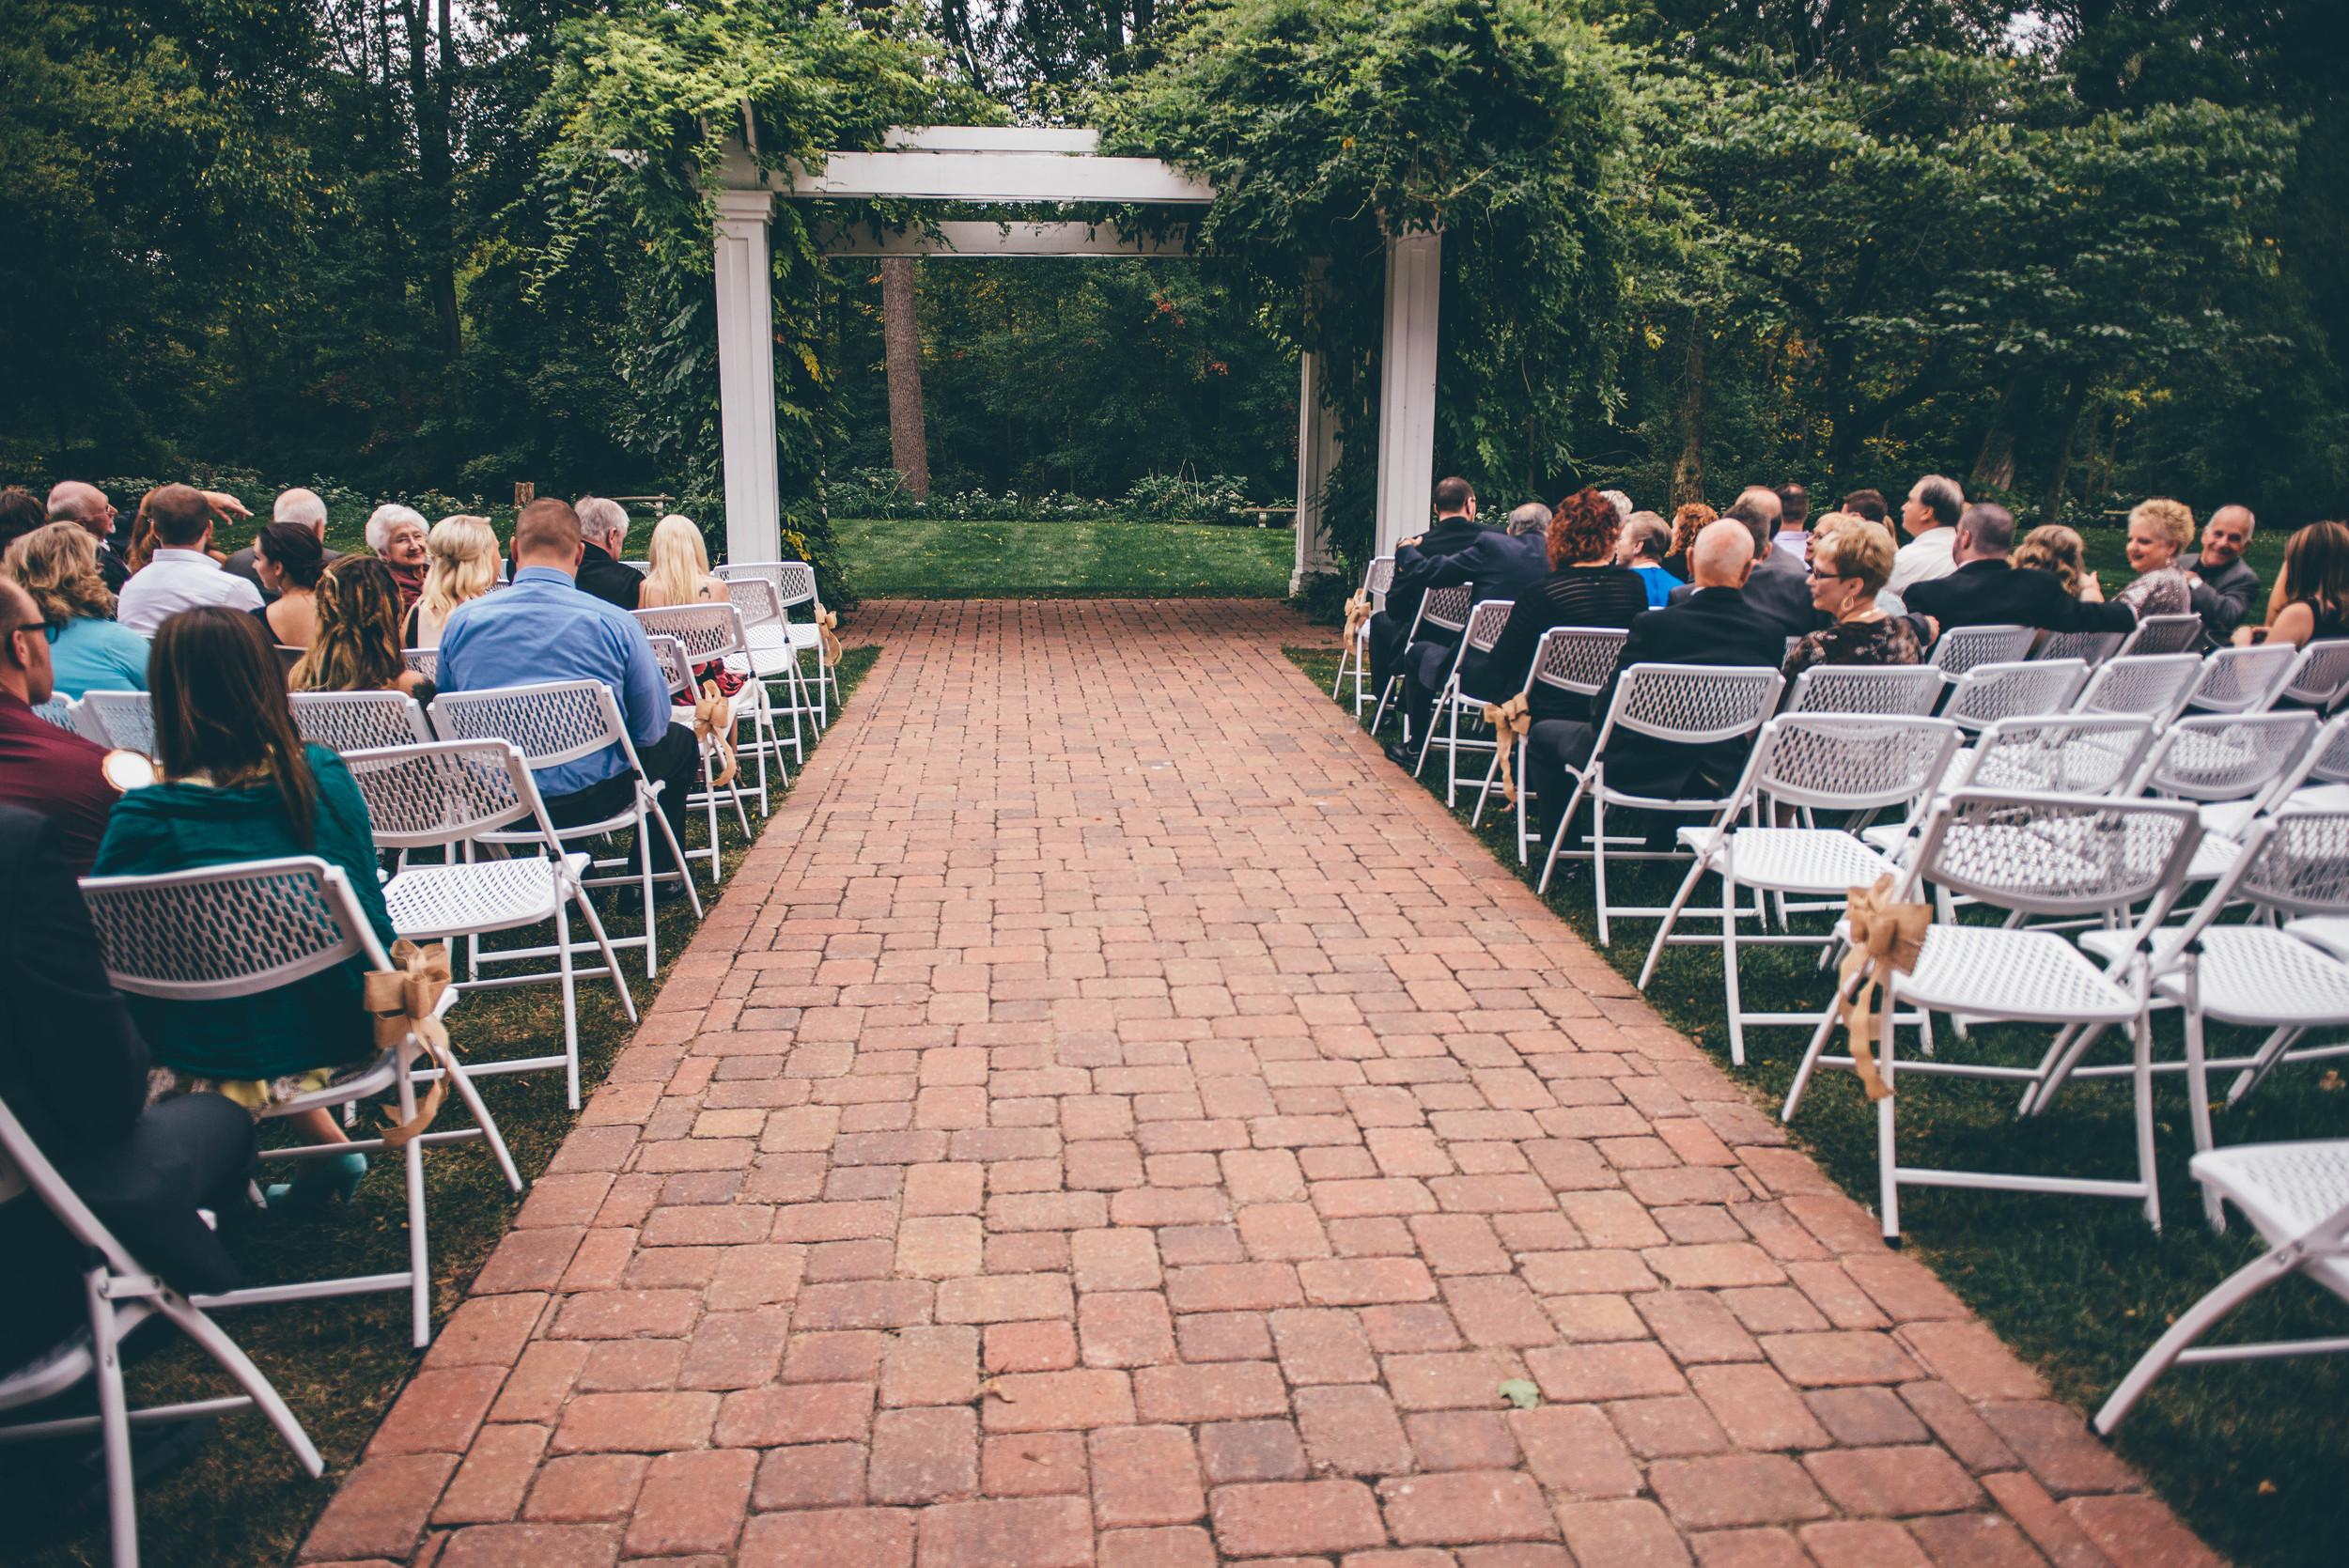 Michigan Vintage Wedding Venue | Miss Lyss Photography | www.misslyssphotography.com